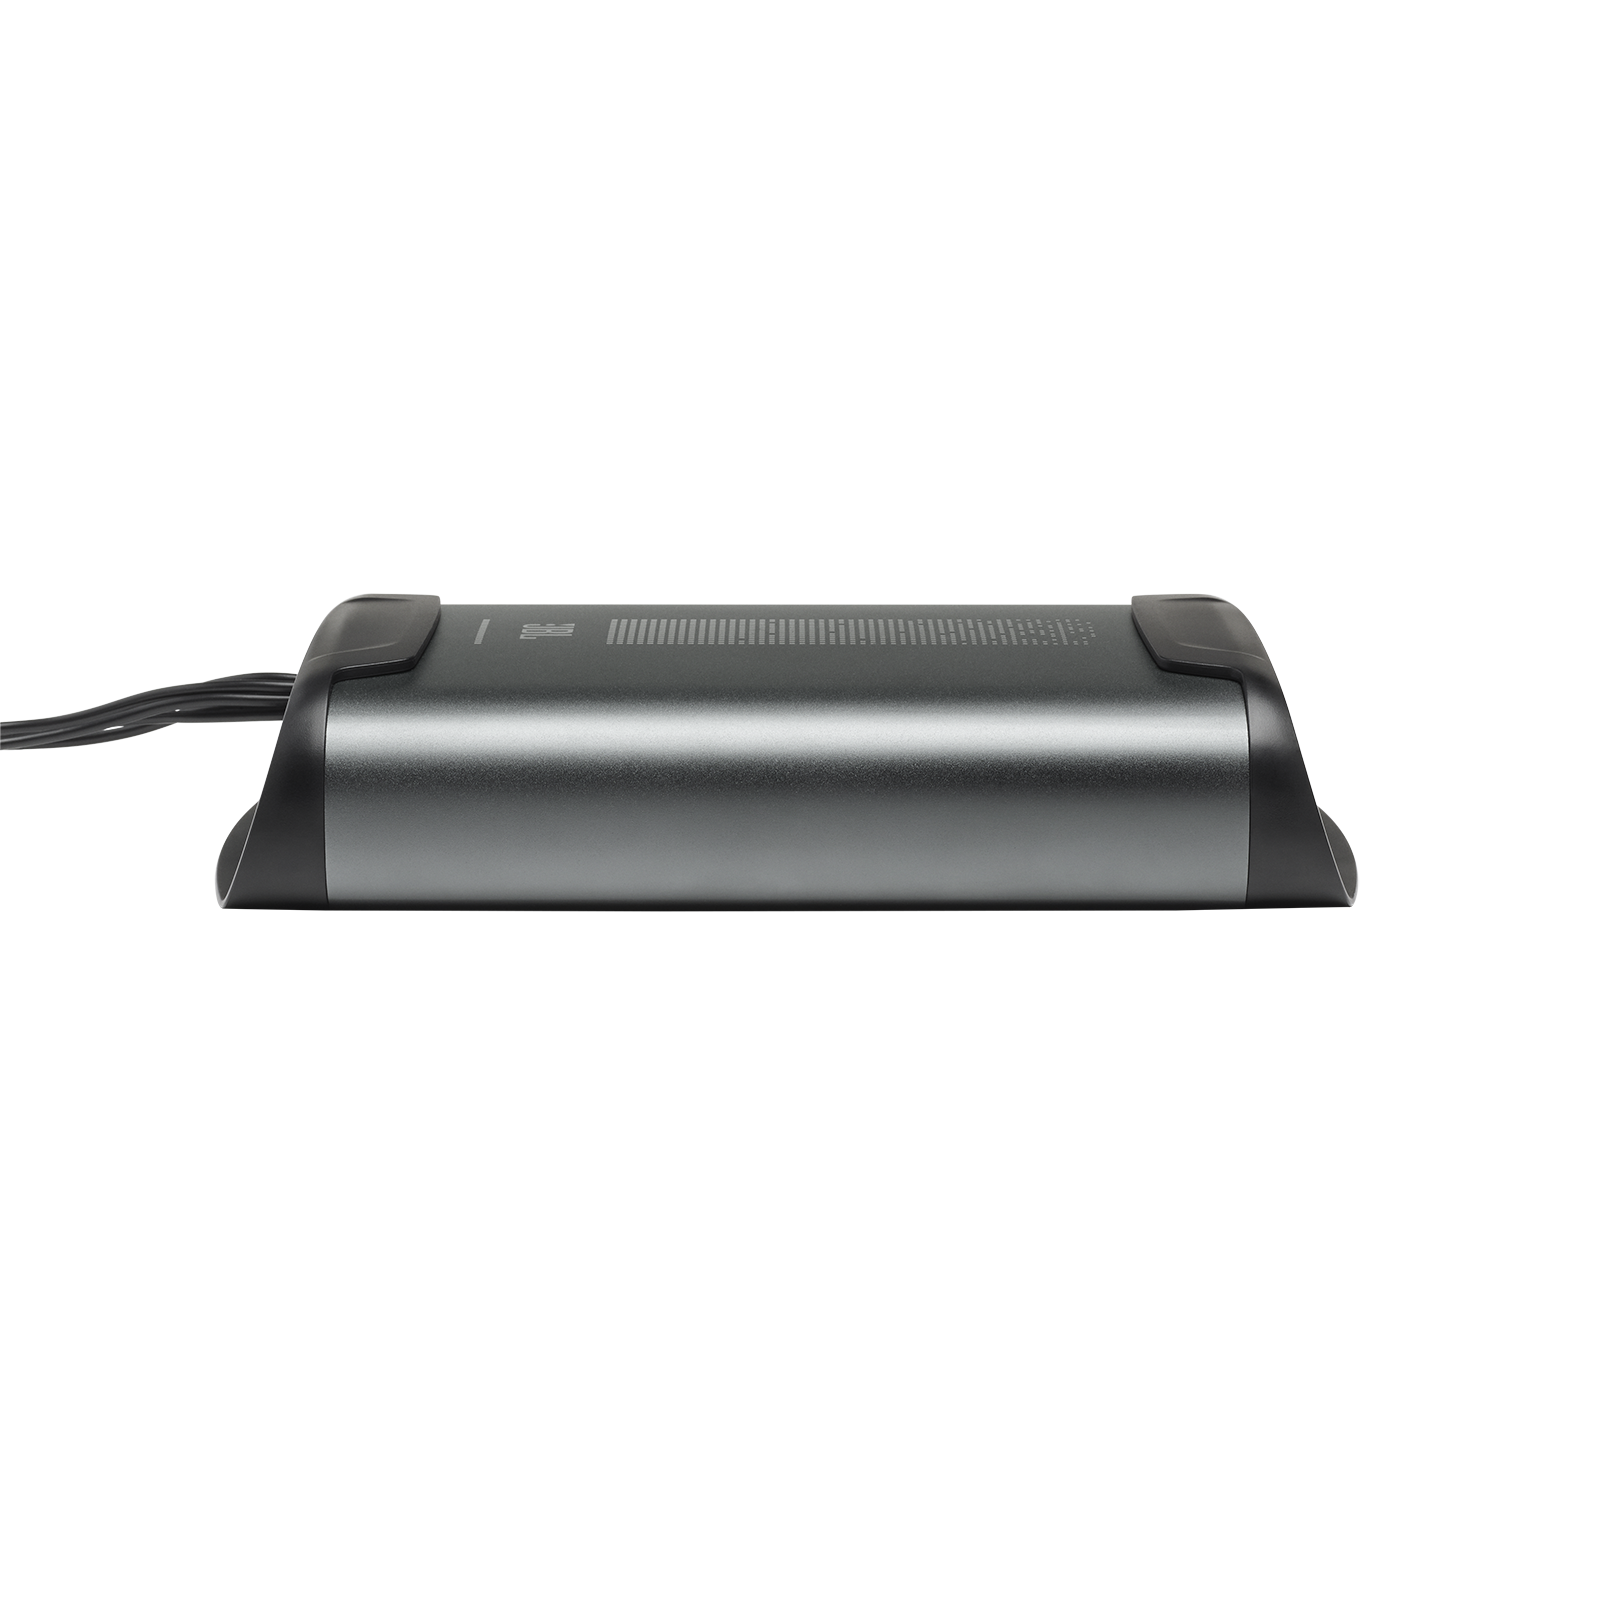 JBL DSP Amplifier DSP4086 - Black - Right